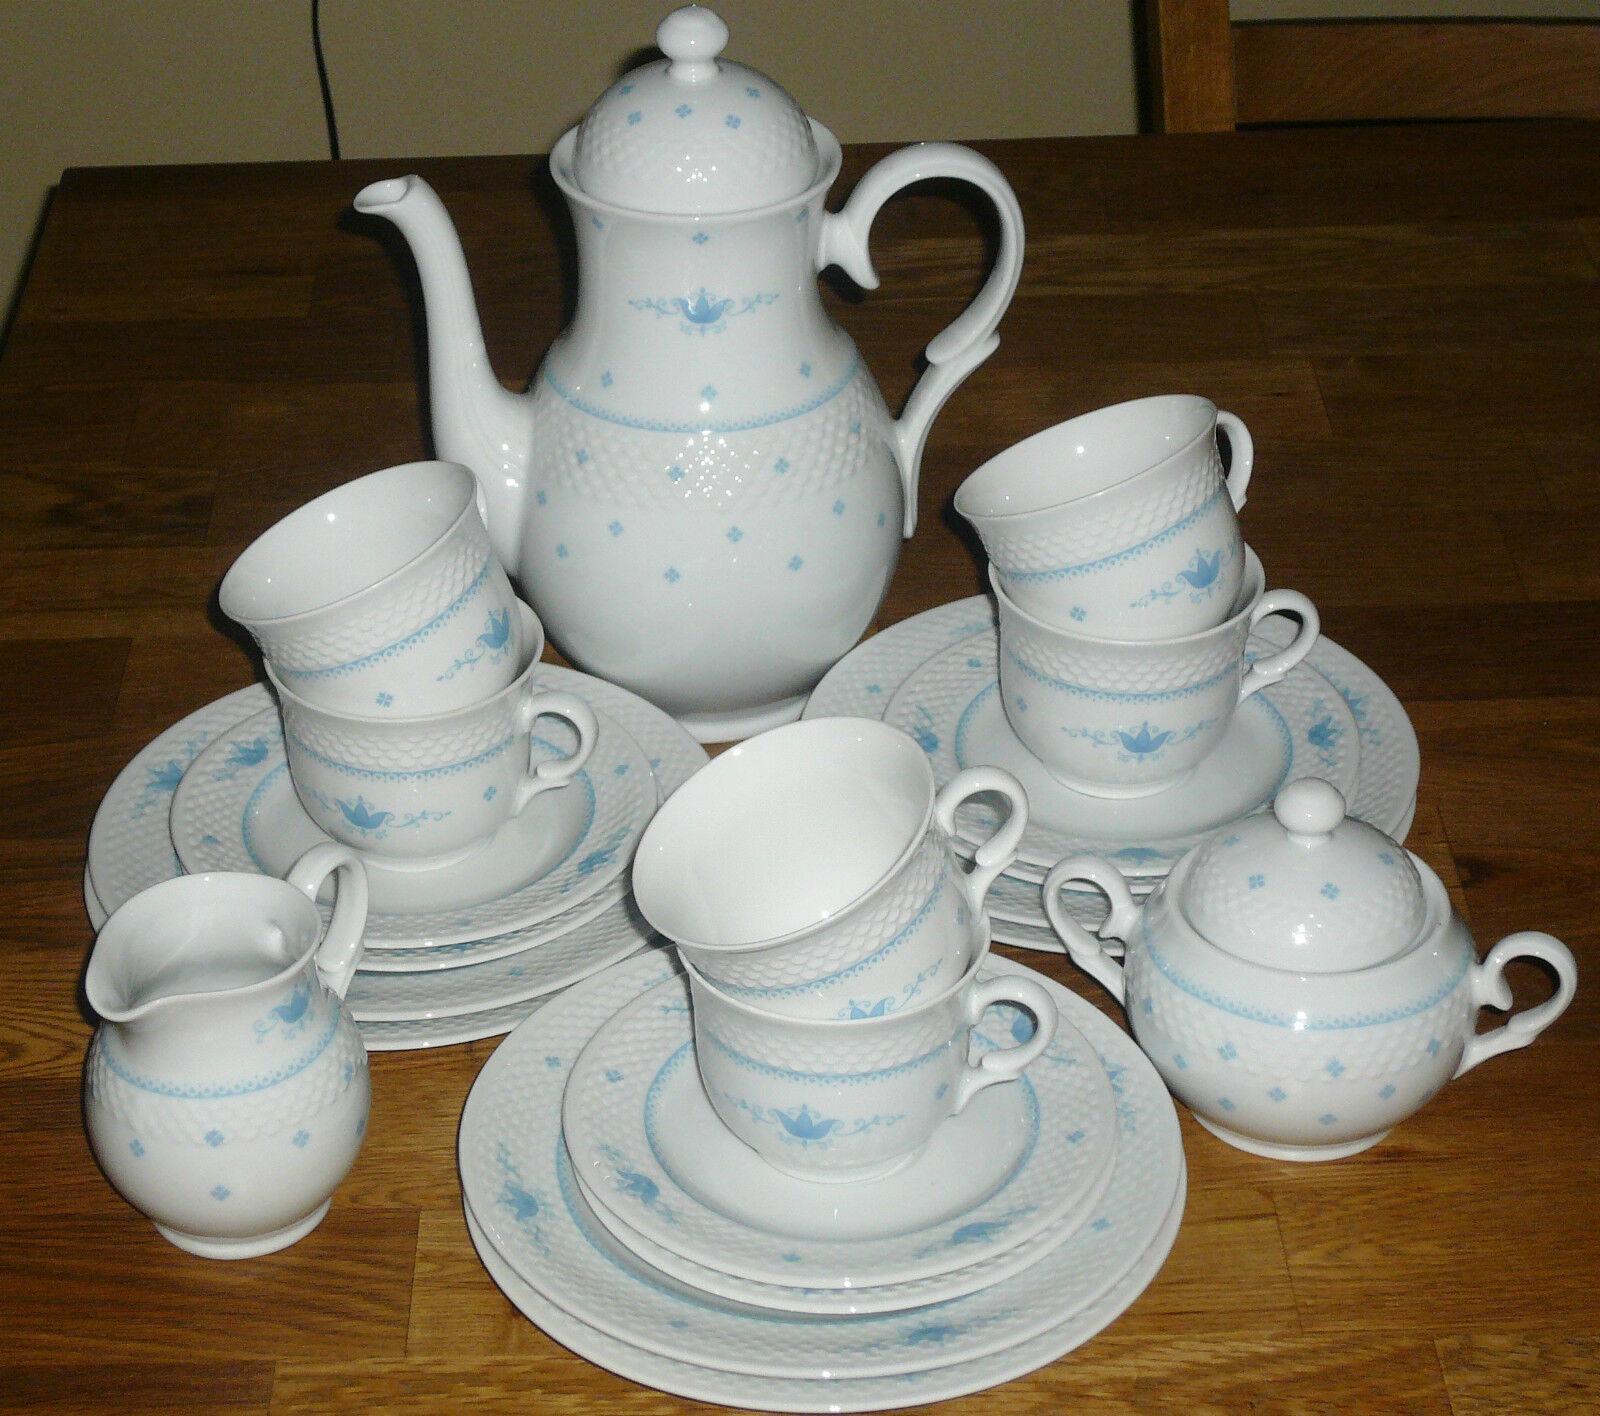 21 Tlg Kaffeeservice   BAVARIA  ARZBREG  SCHUMANN   Blaue Muster